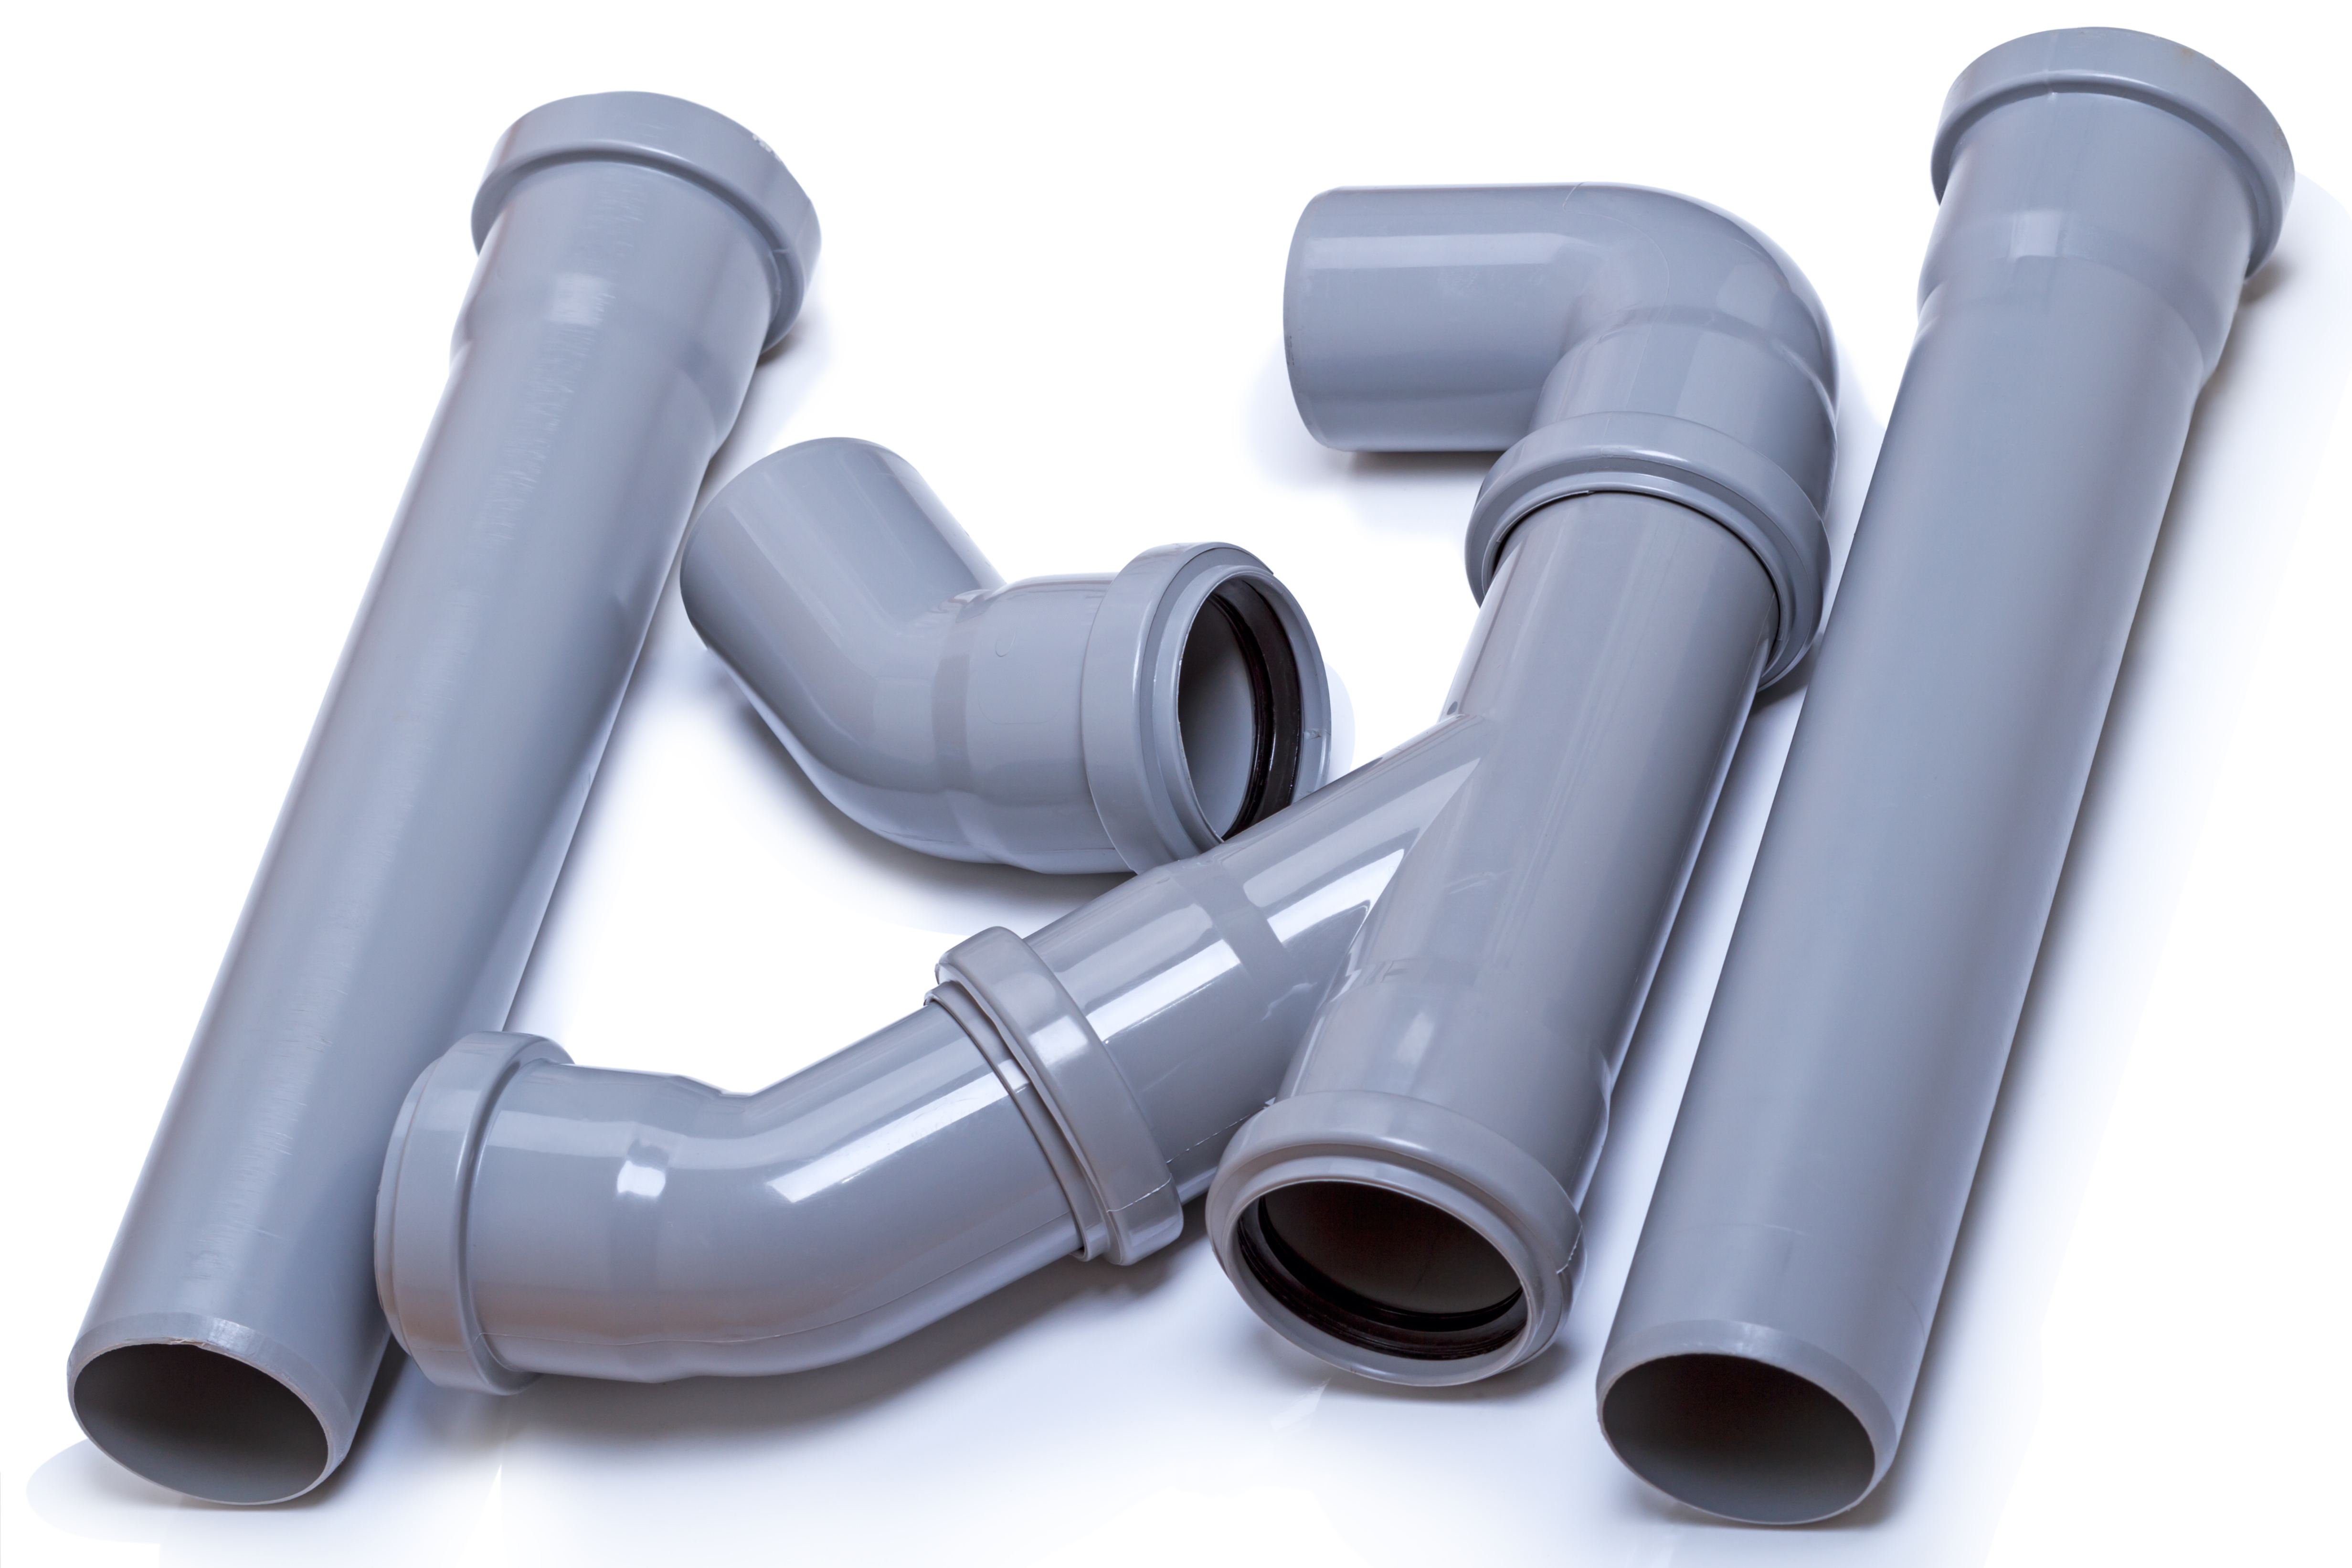 Замена канализационных труб на пластиковые